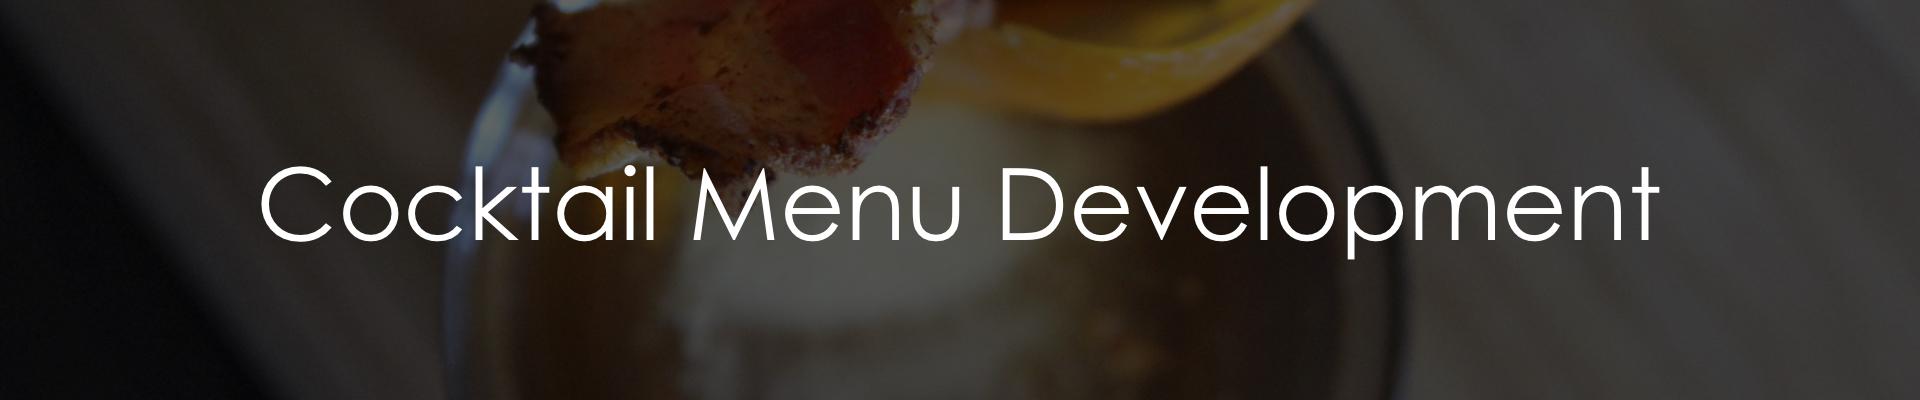 behind-the-wood-cocktail-menu-development